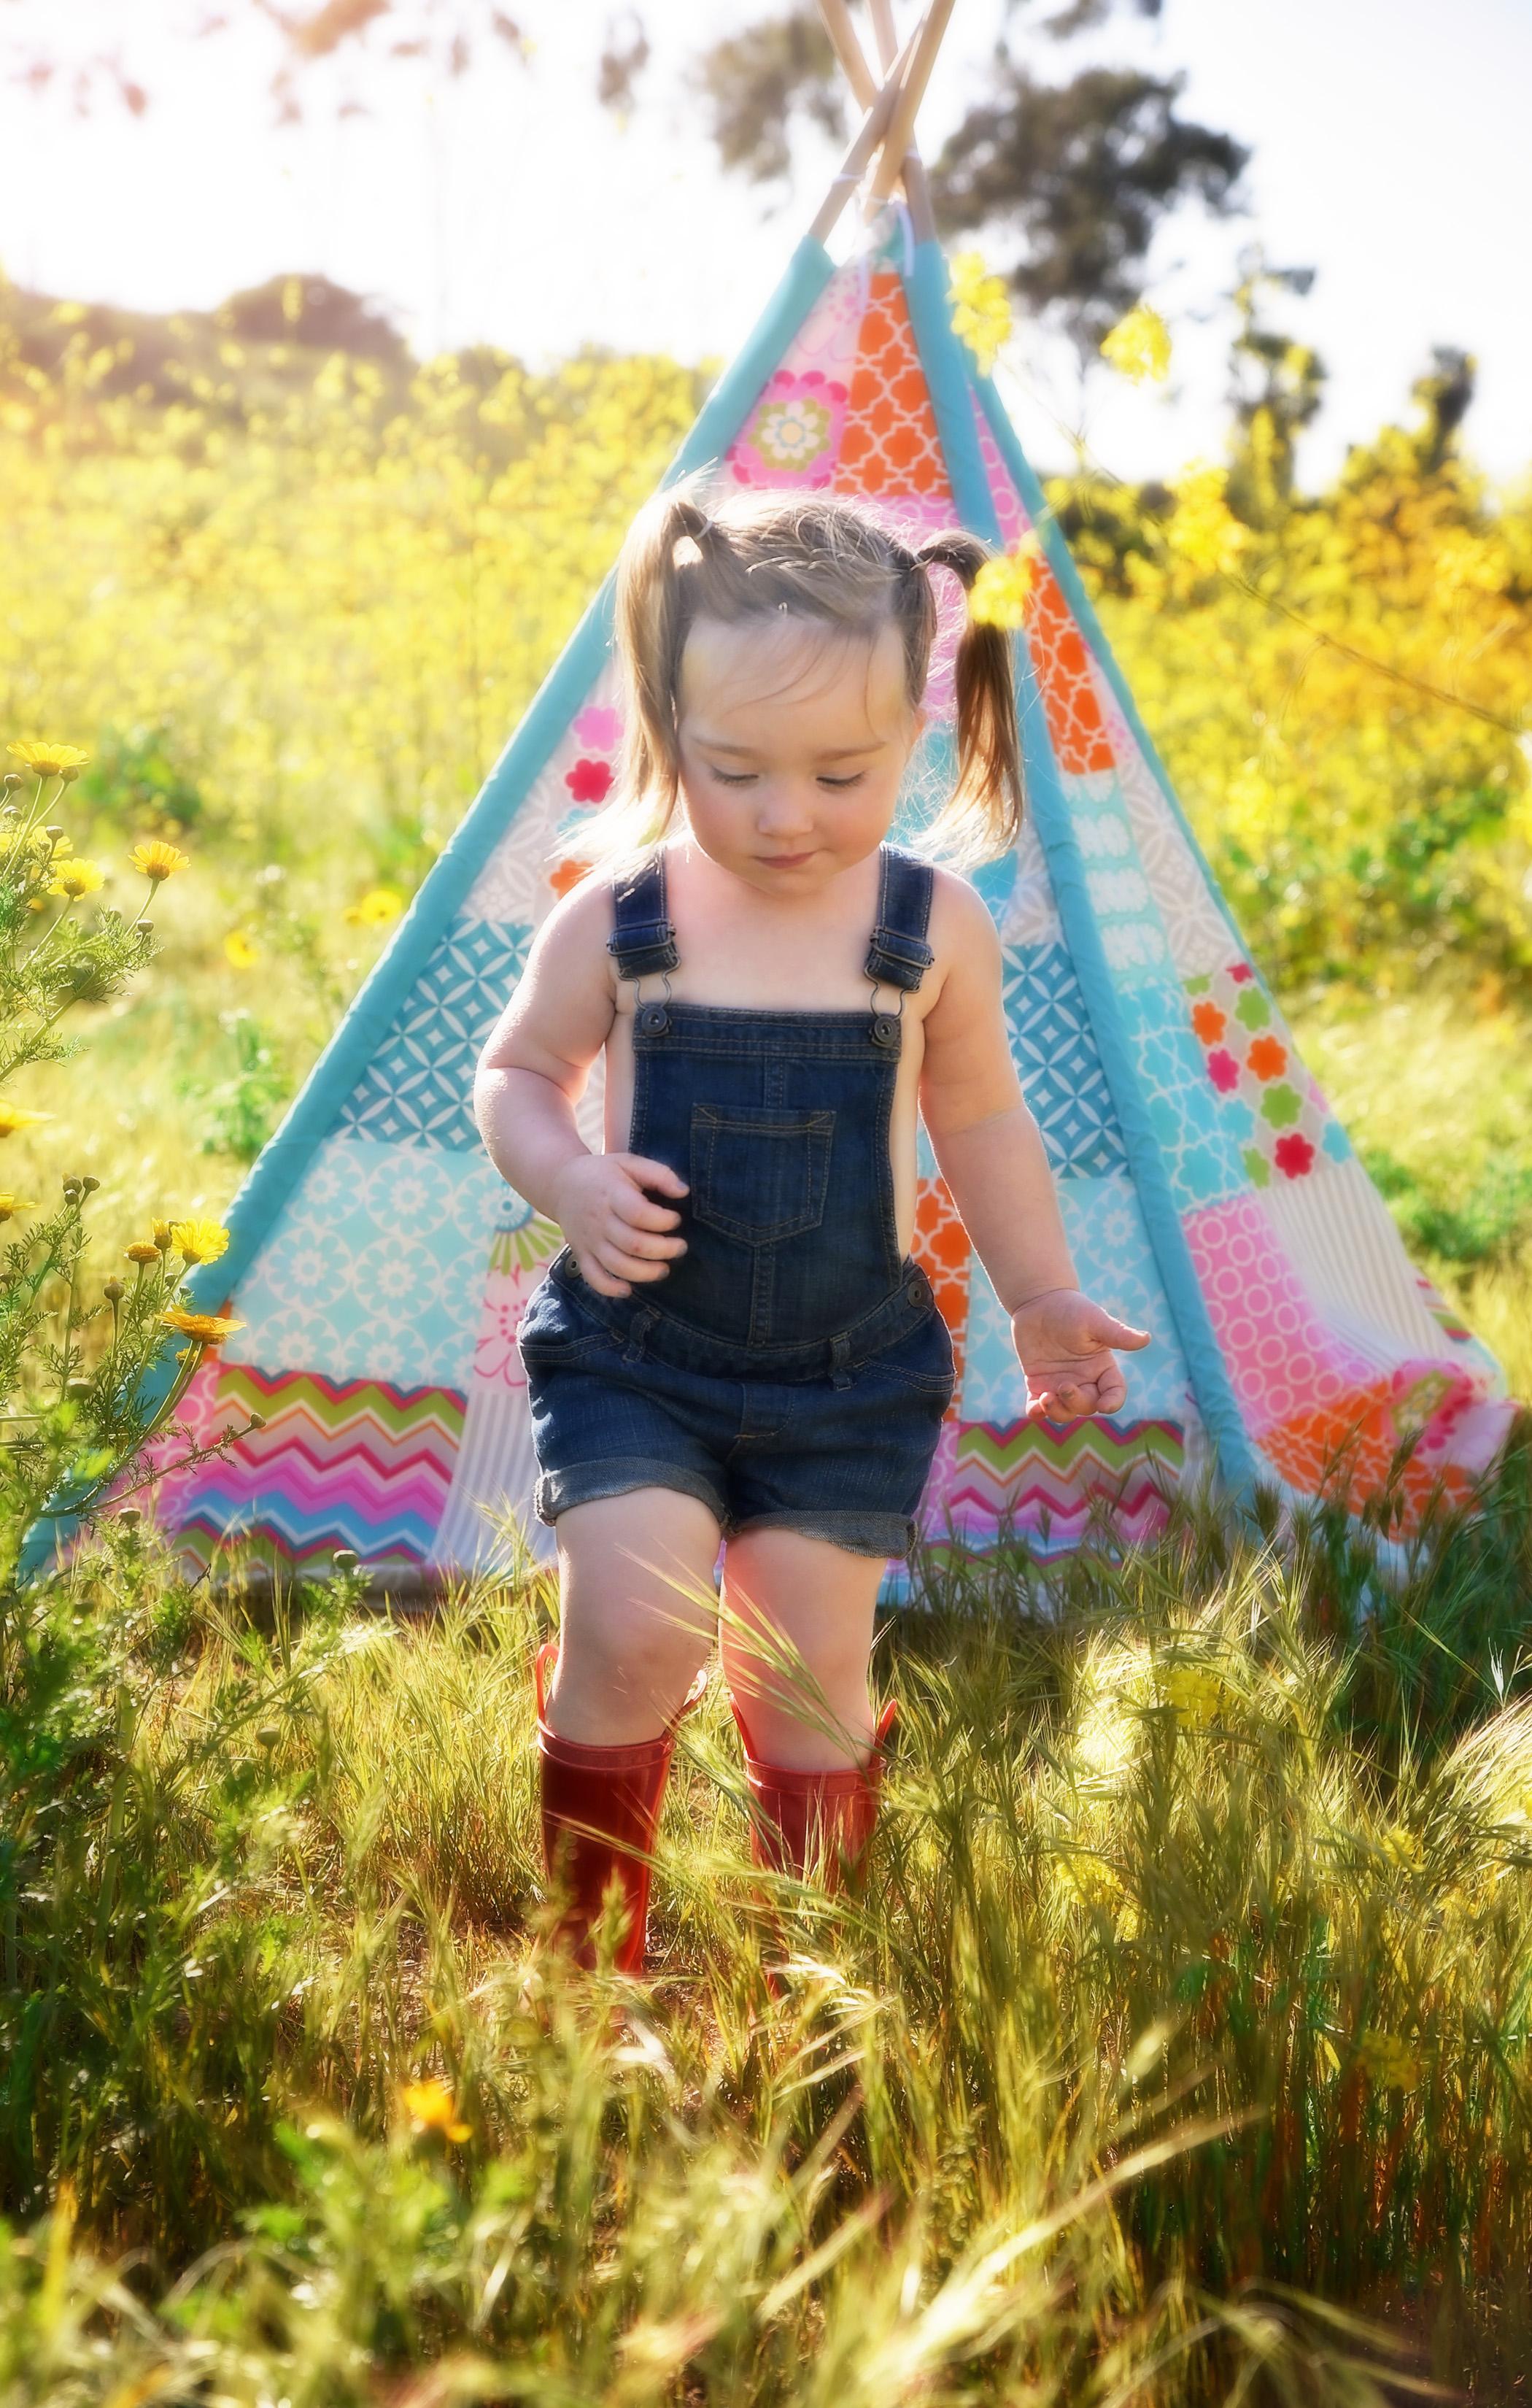 Child Photography Portraits | Lifestyle Portrait Photography | Lacey O